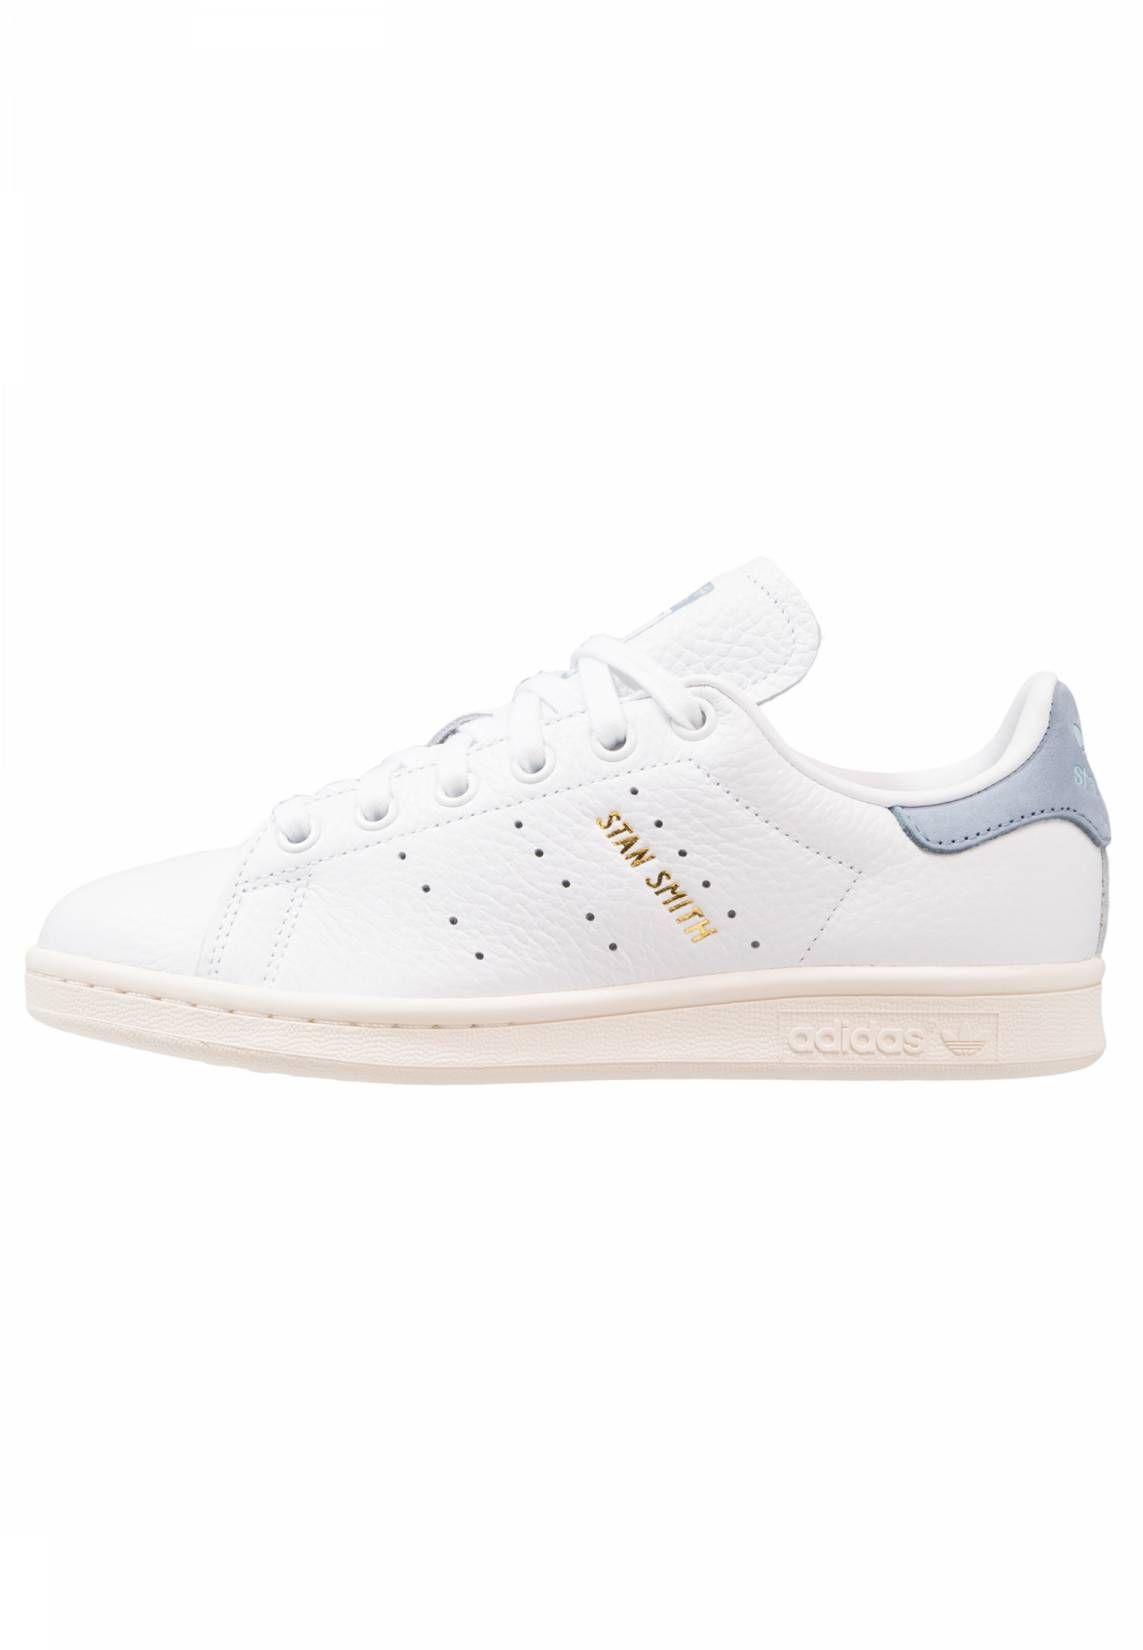 adidas Originals. STAN SMITH - Baskets basses - footwear white/tactile  blue. Semelle